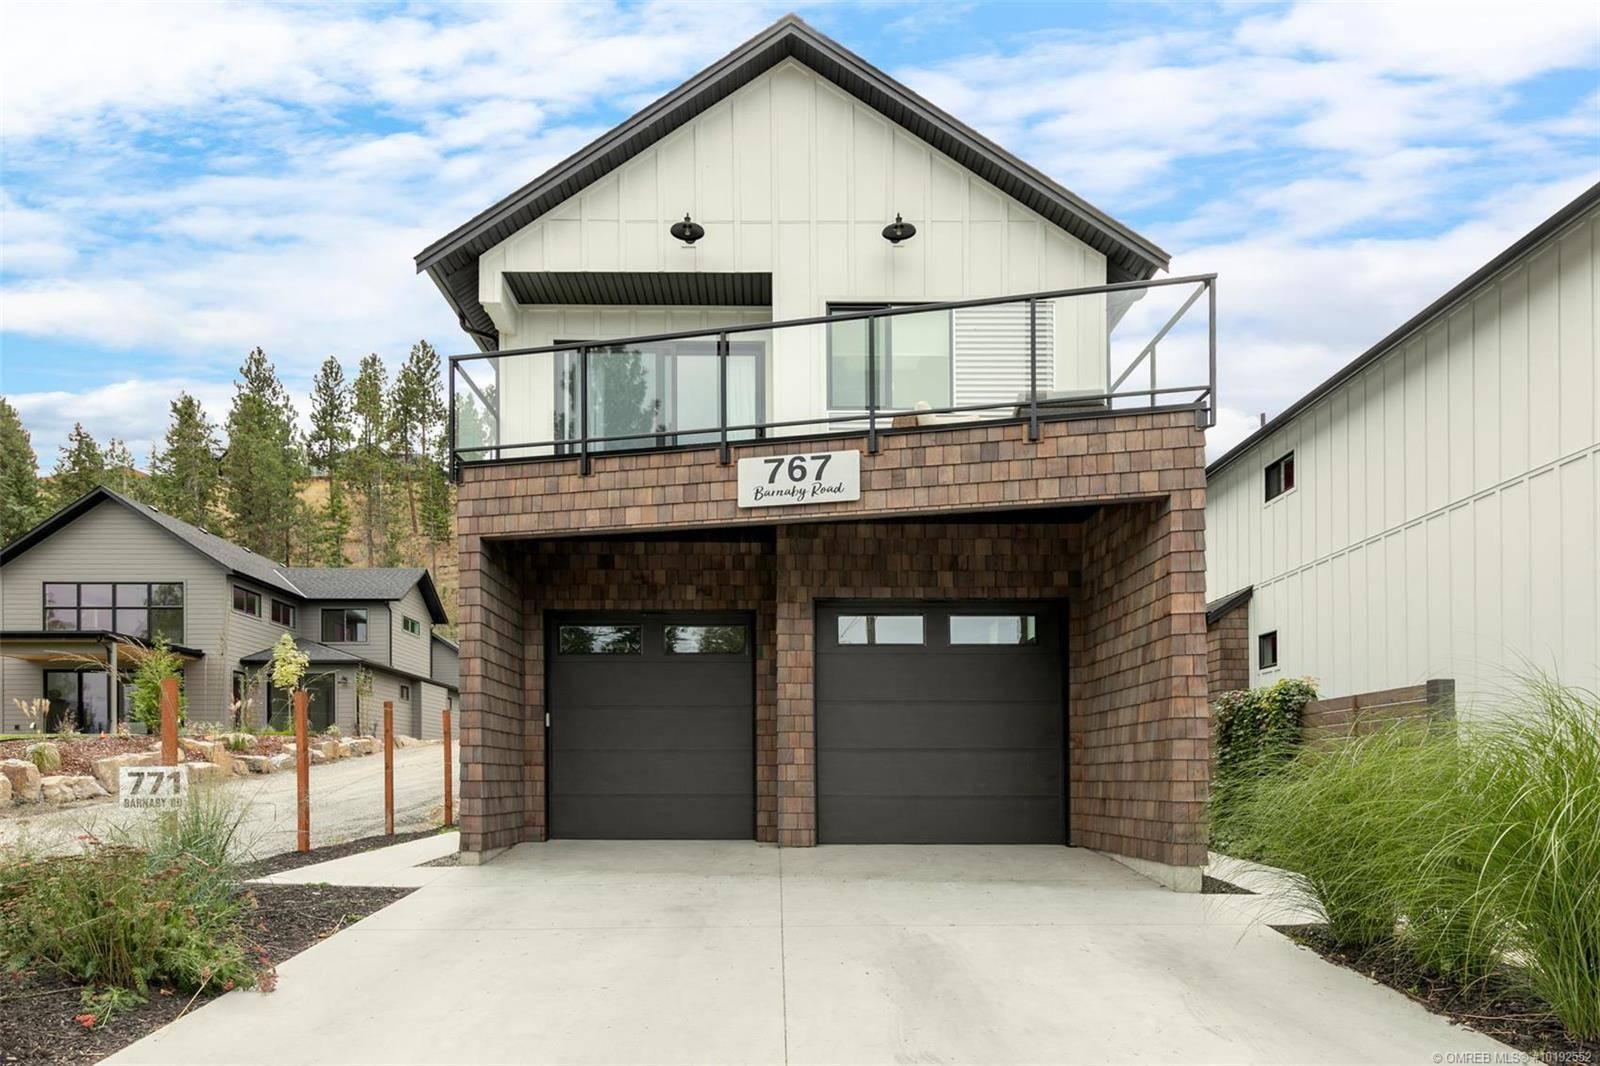 House for sale at 767 Barnaby Rd Kelowna British Columbia - MLS: 10192552